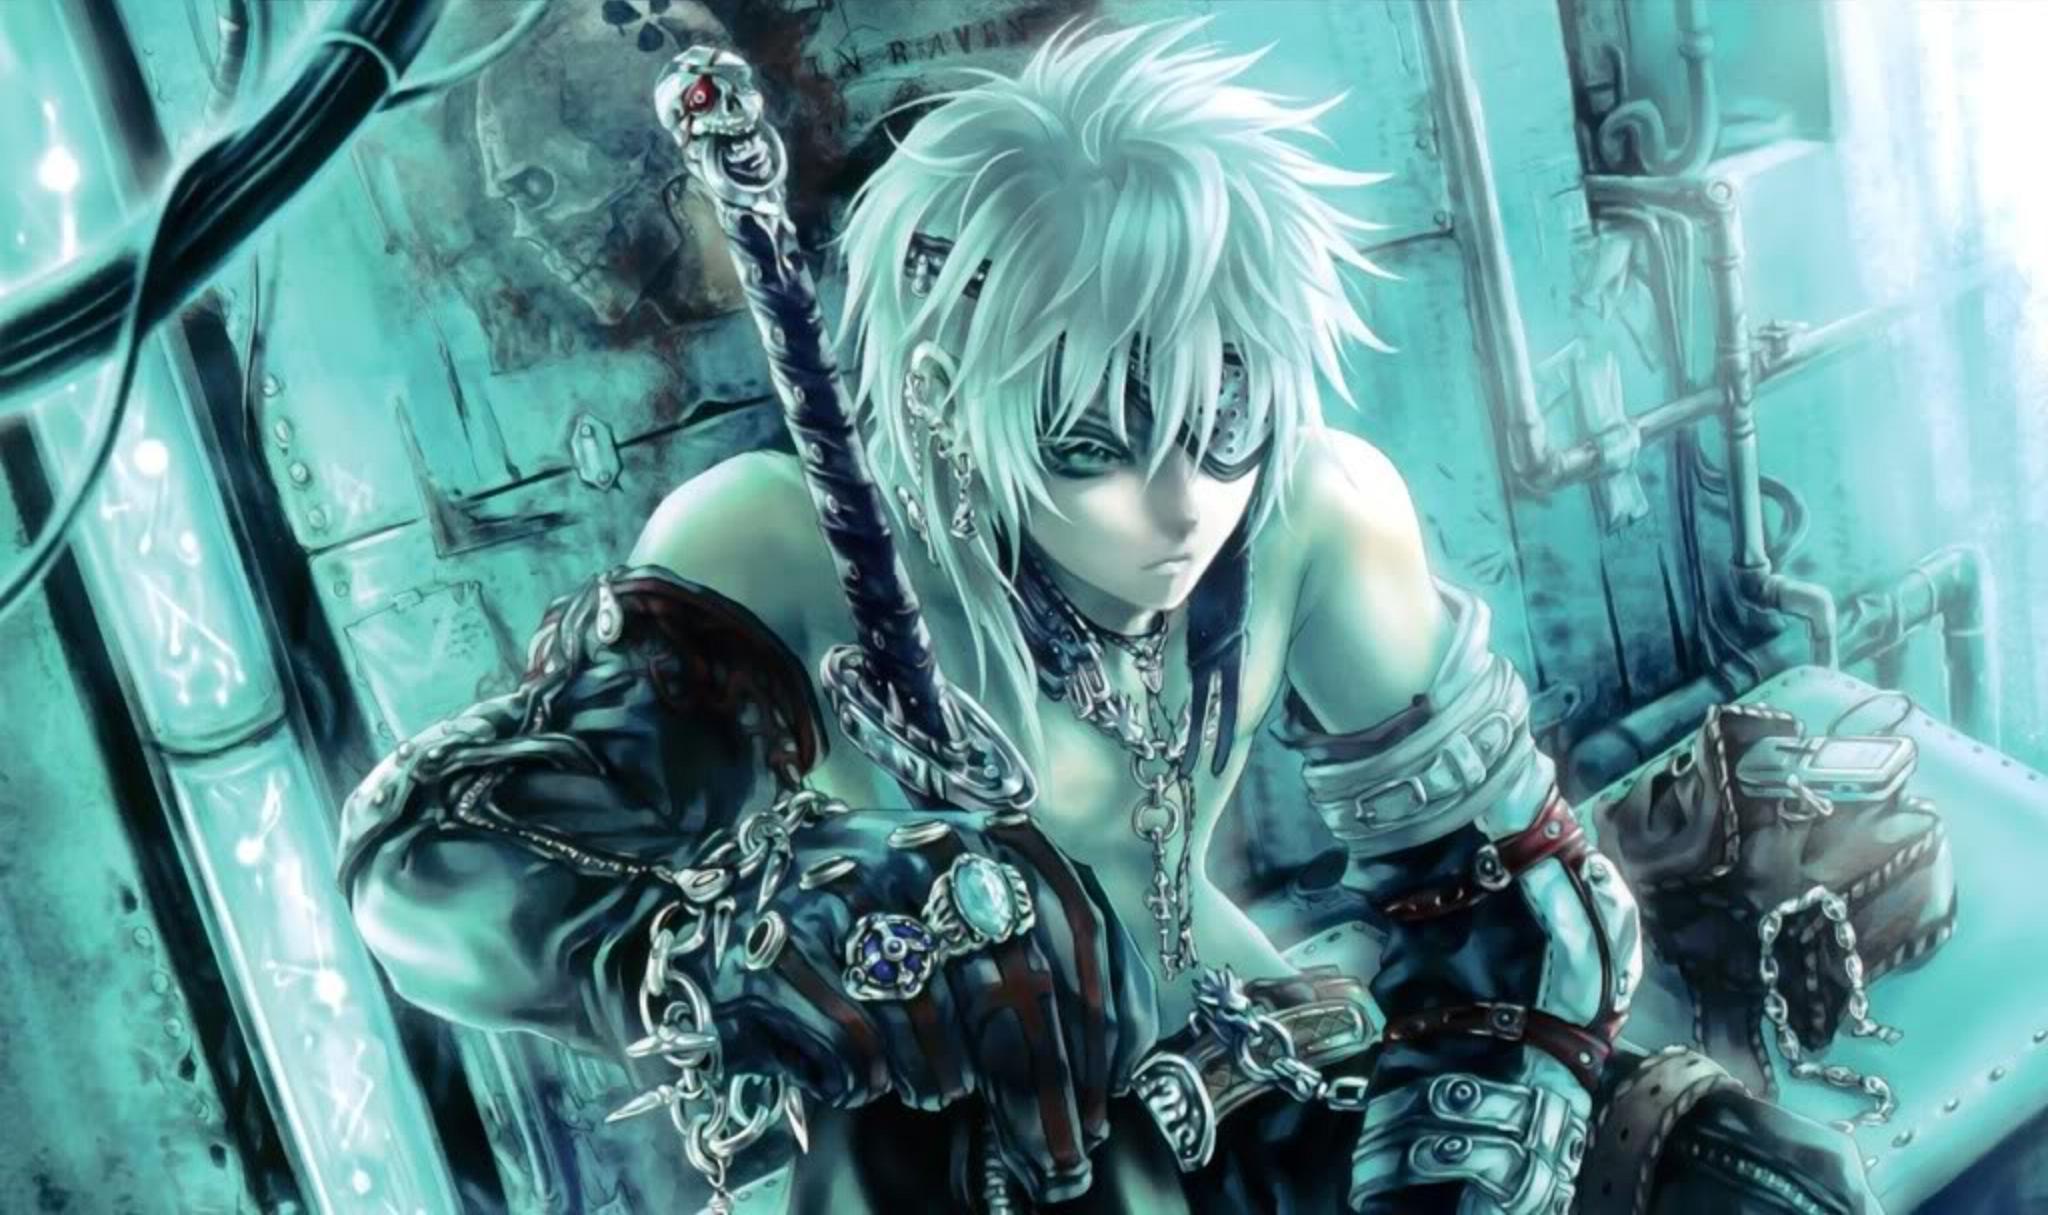 Killer Anime Wallpaper Hd Free Download 2957125 Hd Wallpaper Backgrounds Download